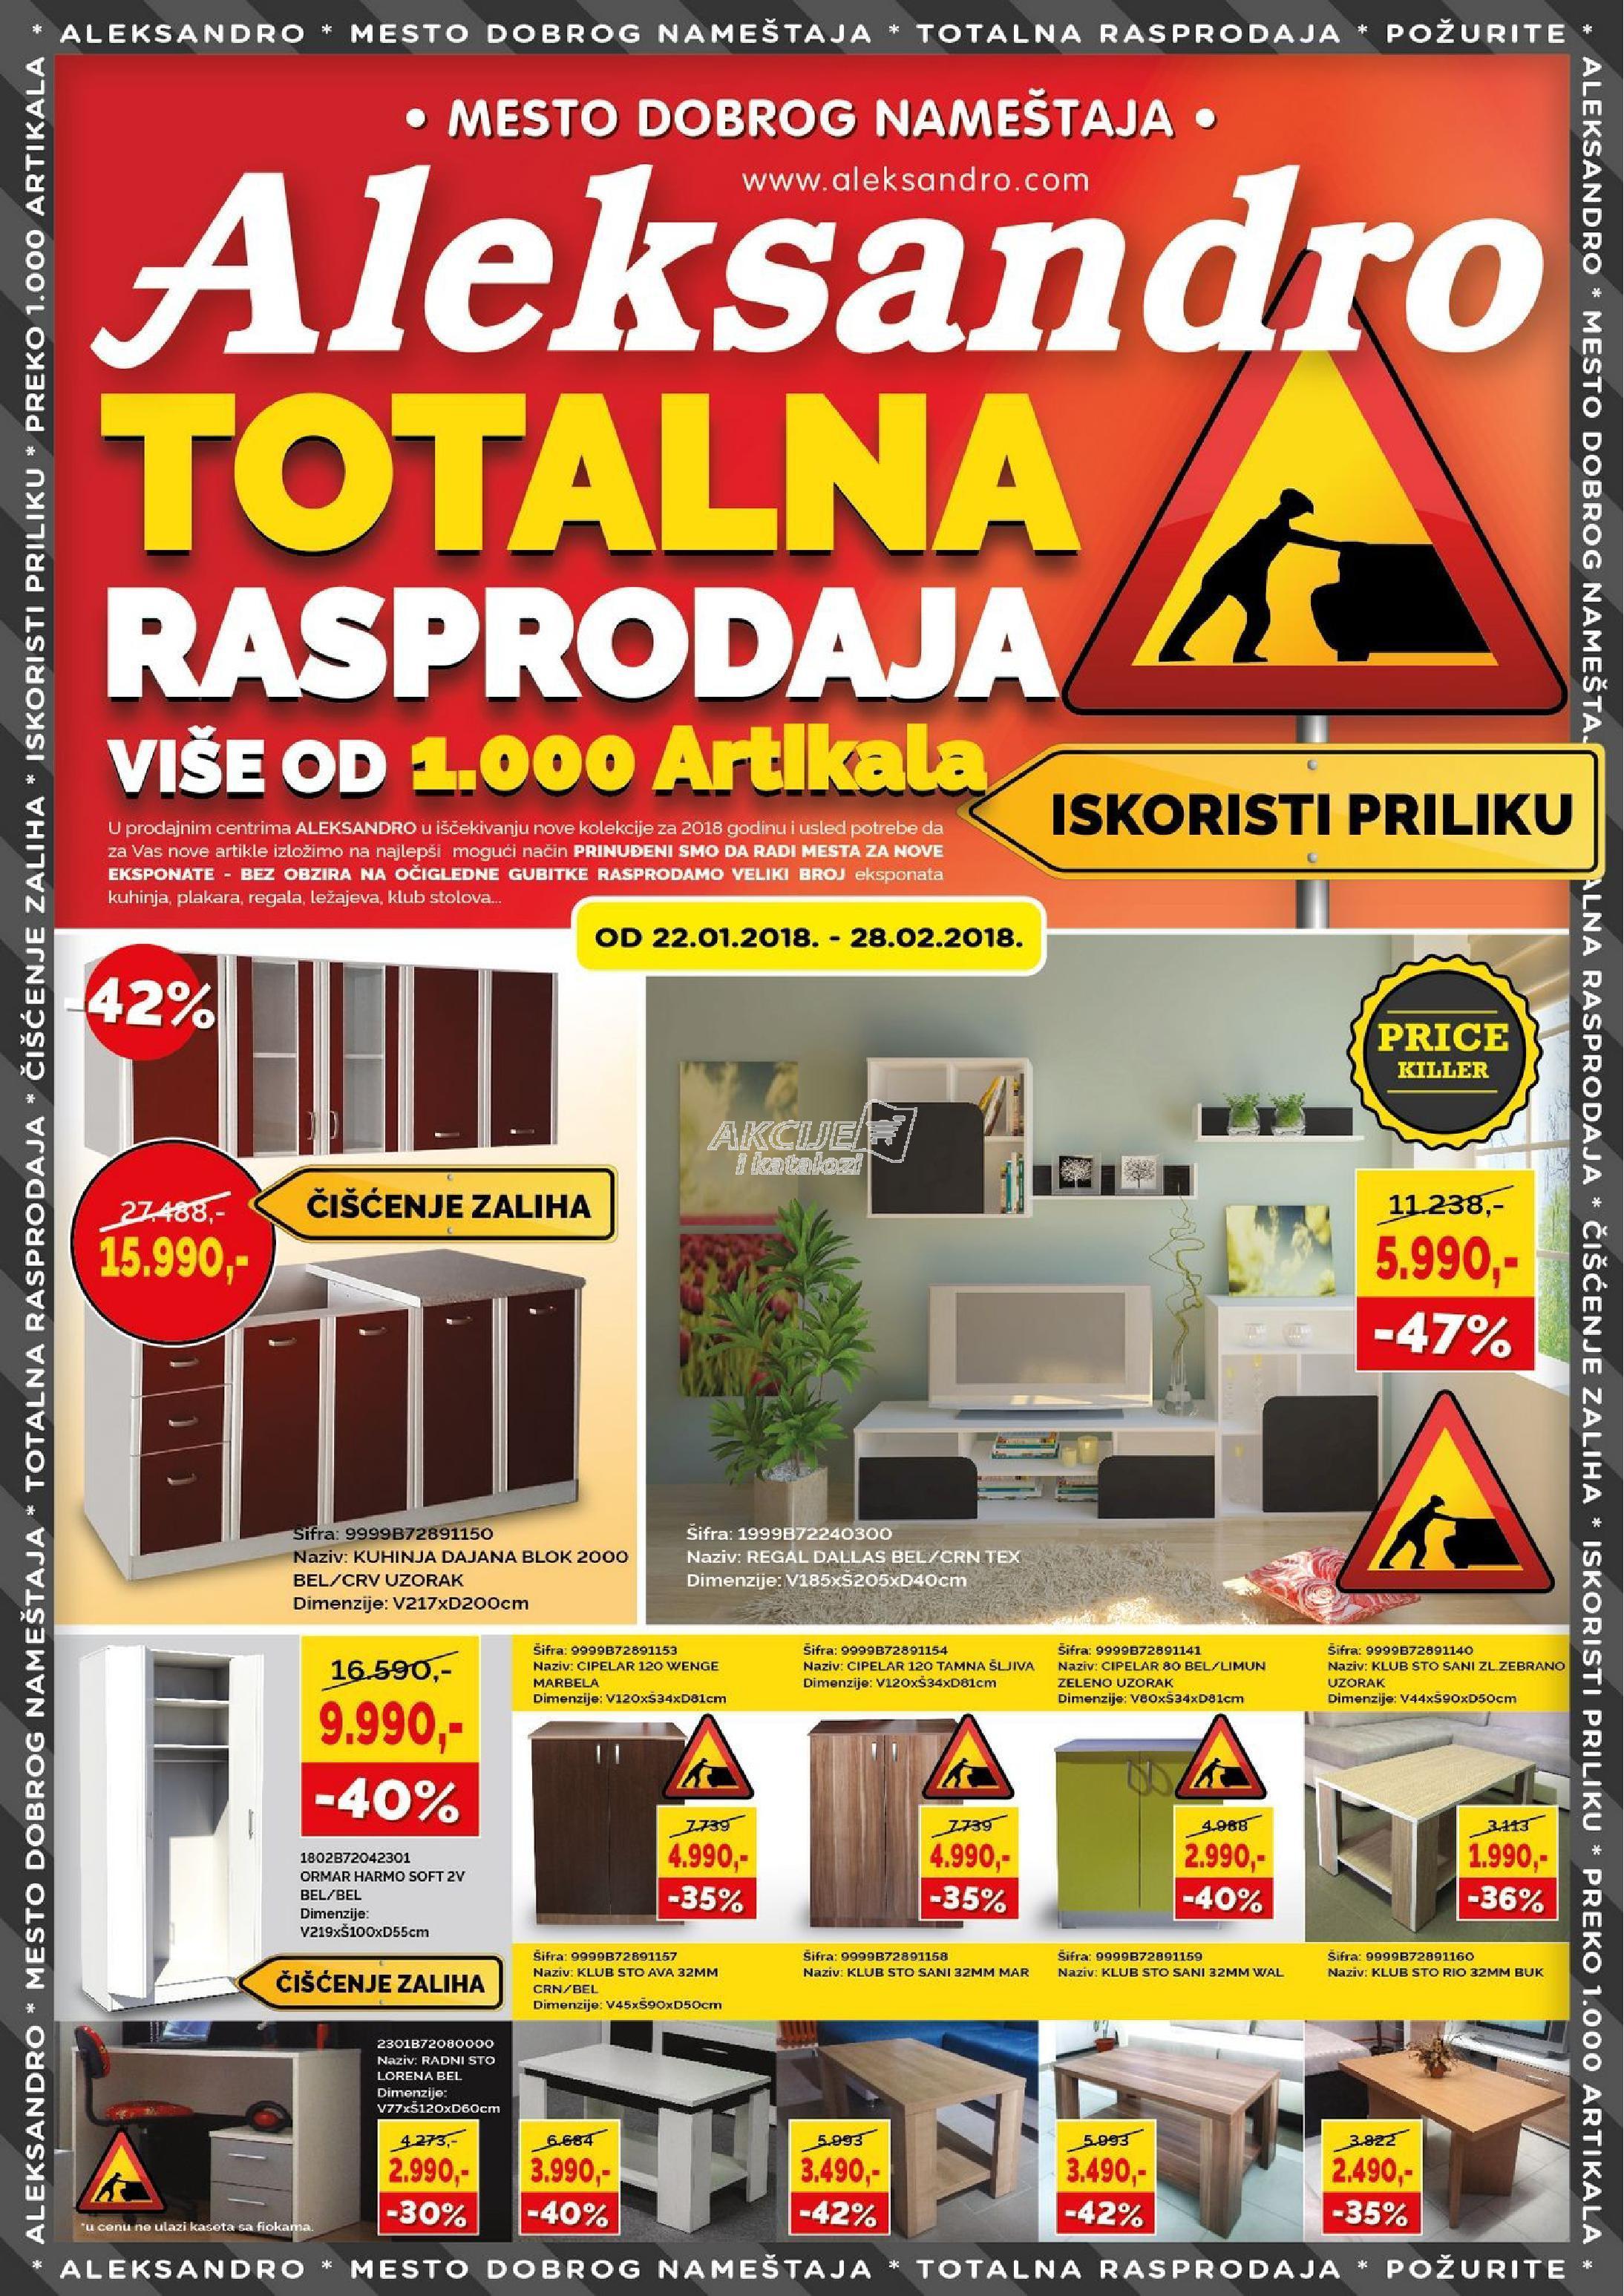 Aleksandro - Redovna akcija totalne rasprodaje